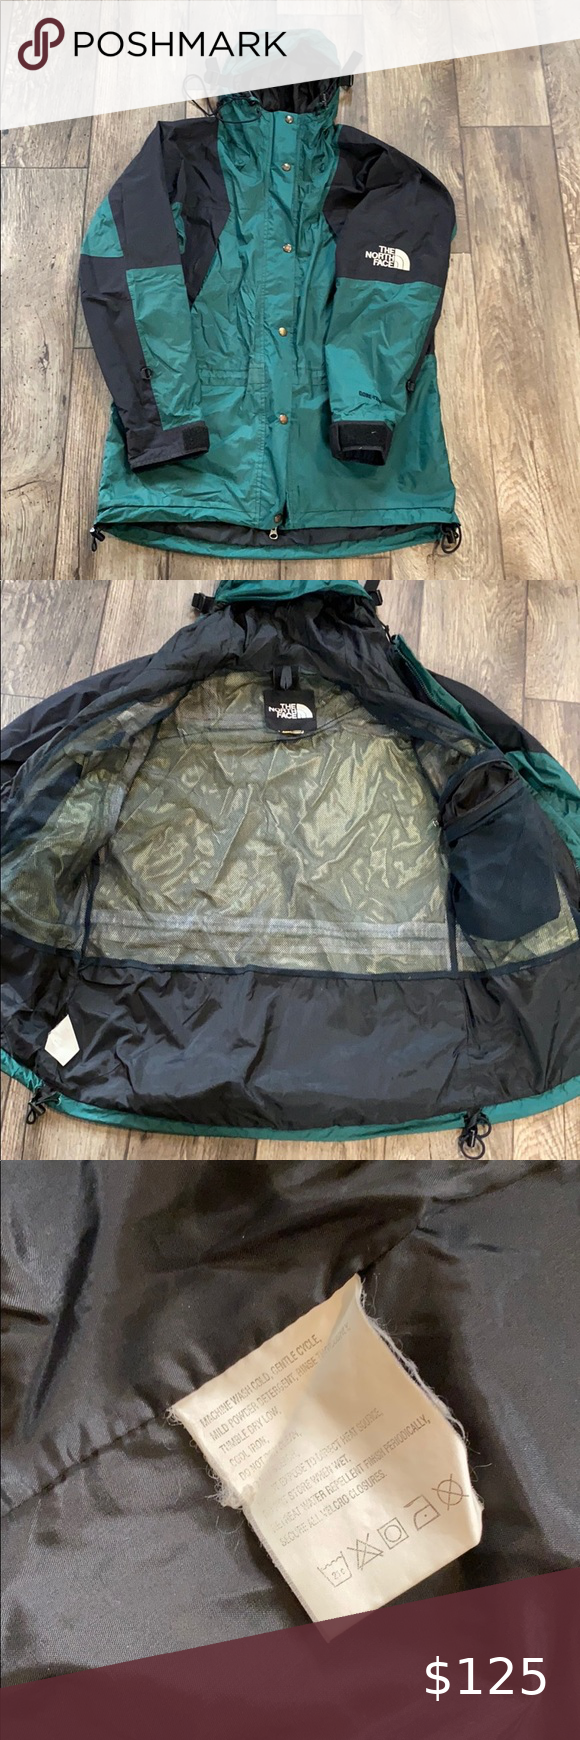 Vintage North Face Gore Tex Jacket North Face Jacket The North Face Gore Tex Jacket [ 1740 x 580 Pixel ]